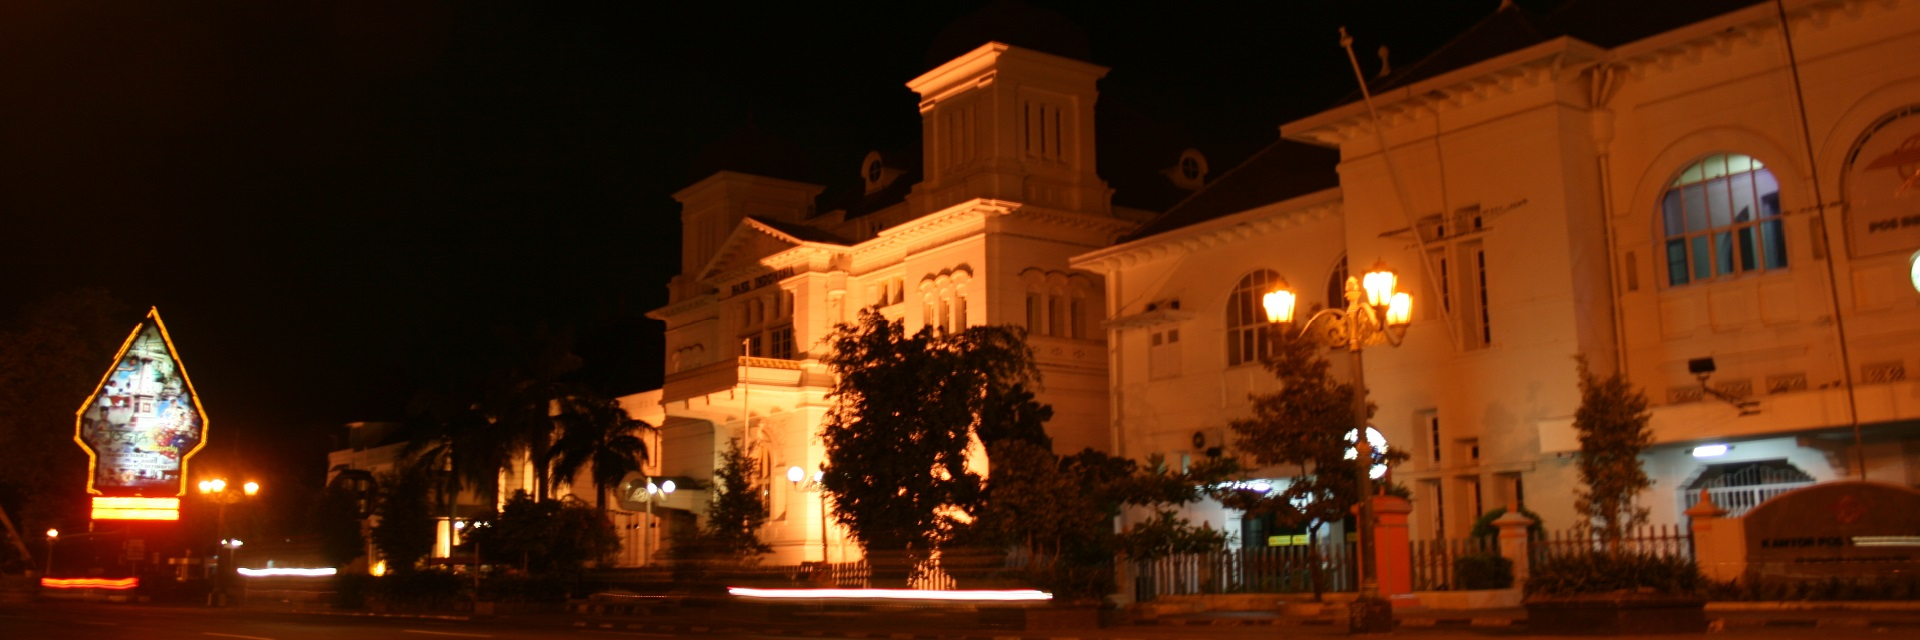 Malam di Jogja, Yogyakarta, Kota Yogyakarta, Dolan Dolen, Dolaners Malam di Jogja - Dolan Dolen